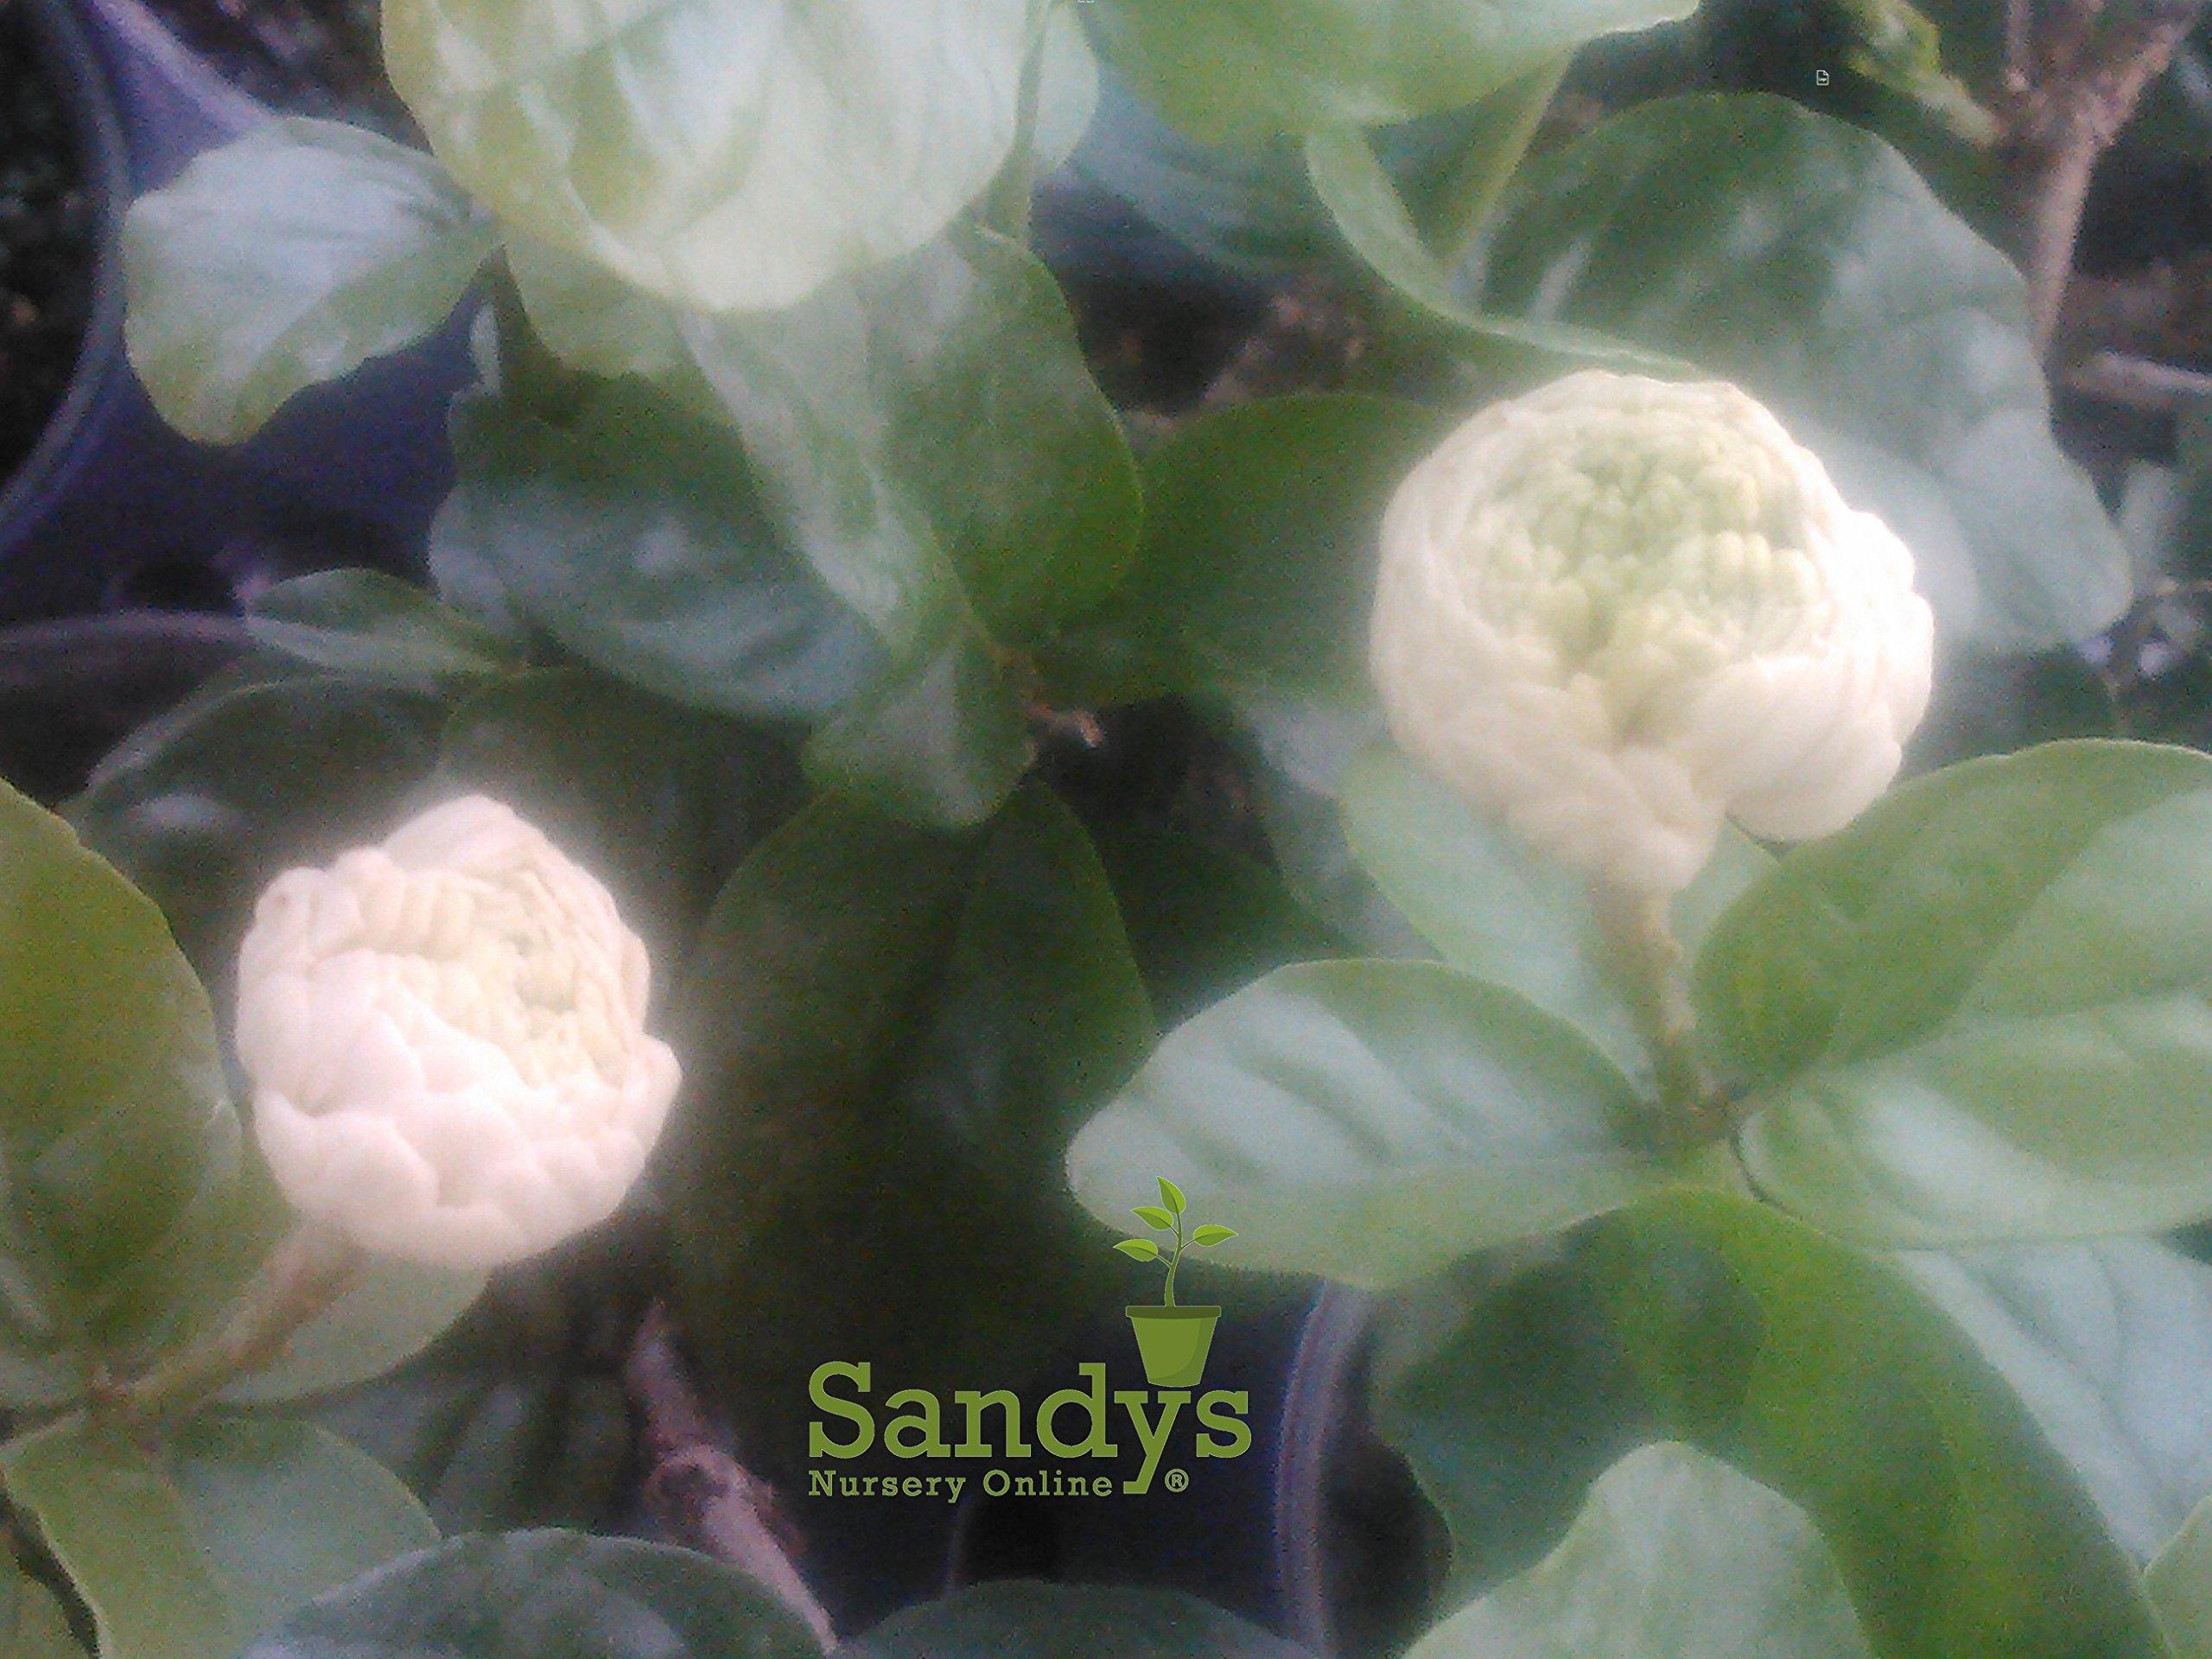 Sandys Nursery Online Jasmine Sambac Grand Duke of Tuscany Live Plant in 3.5'' Pot+ Fertilizer